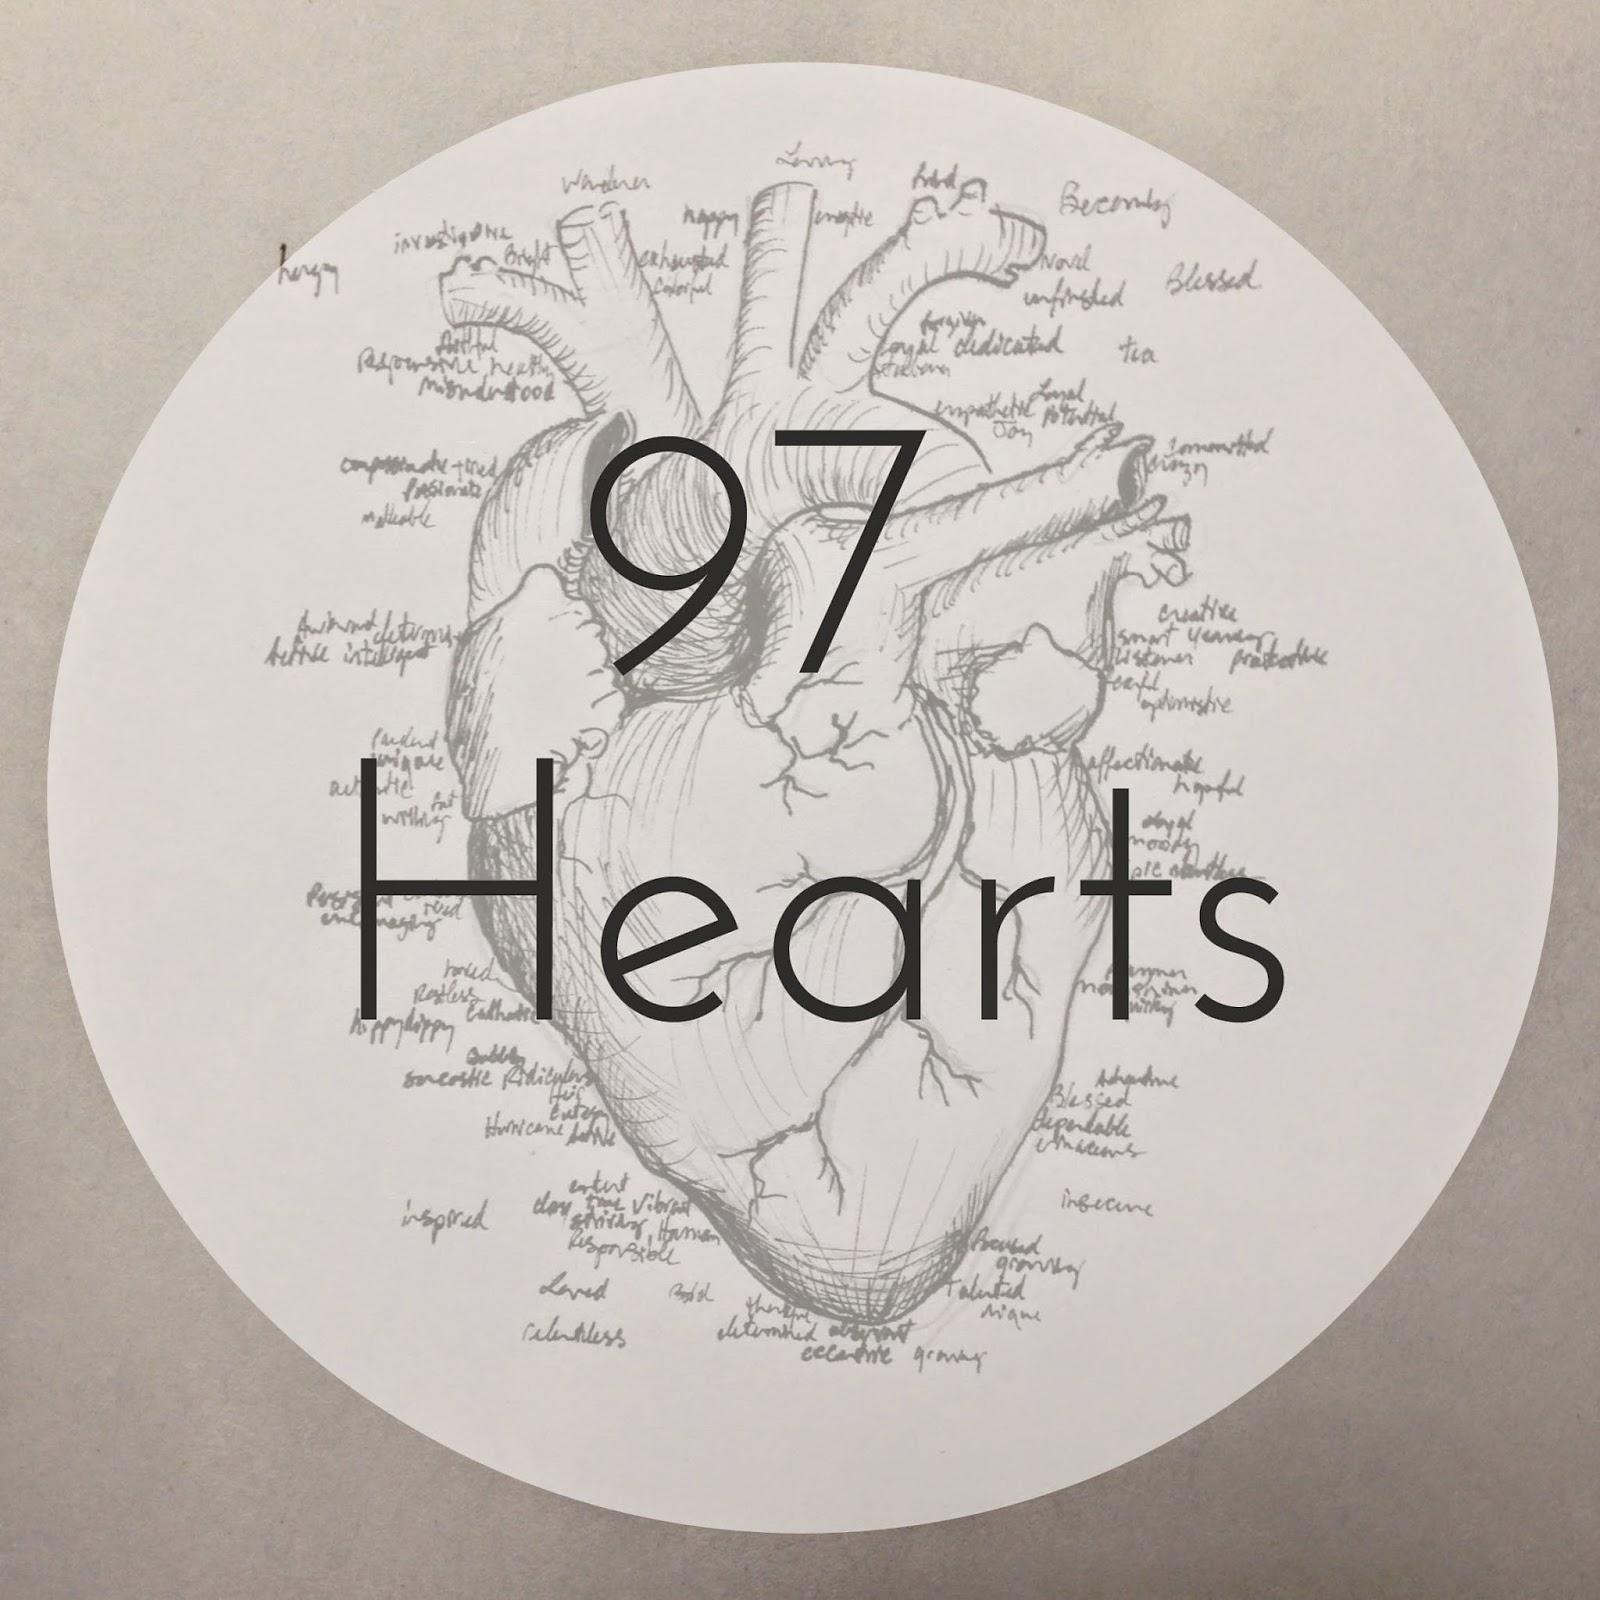 97 Hearts anatomical heart drawing